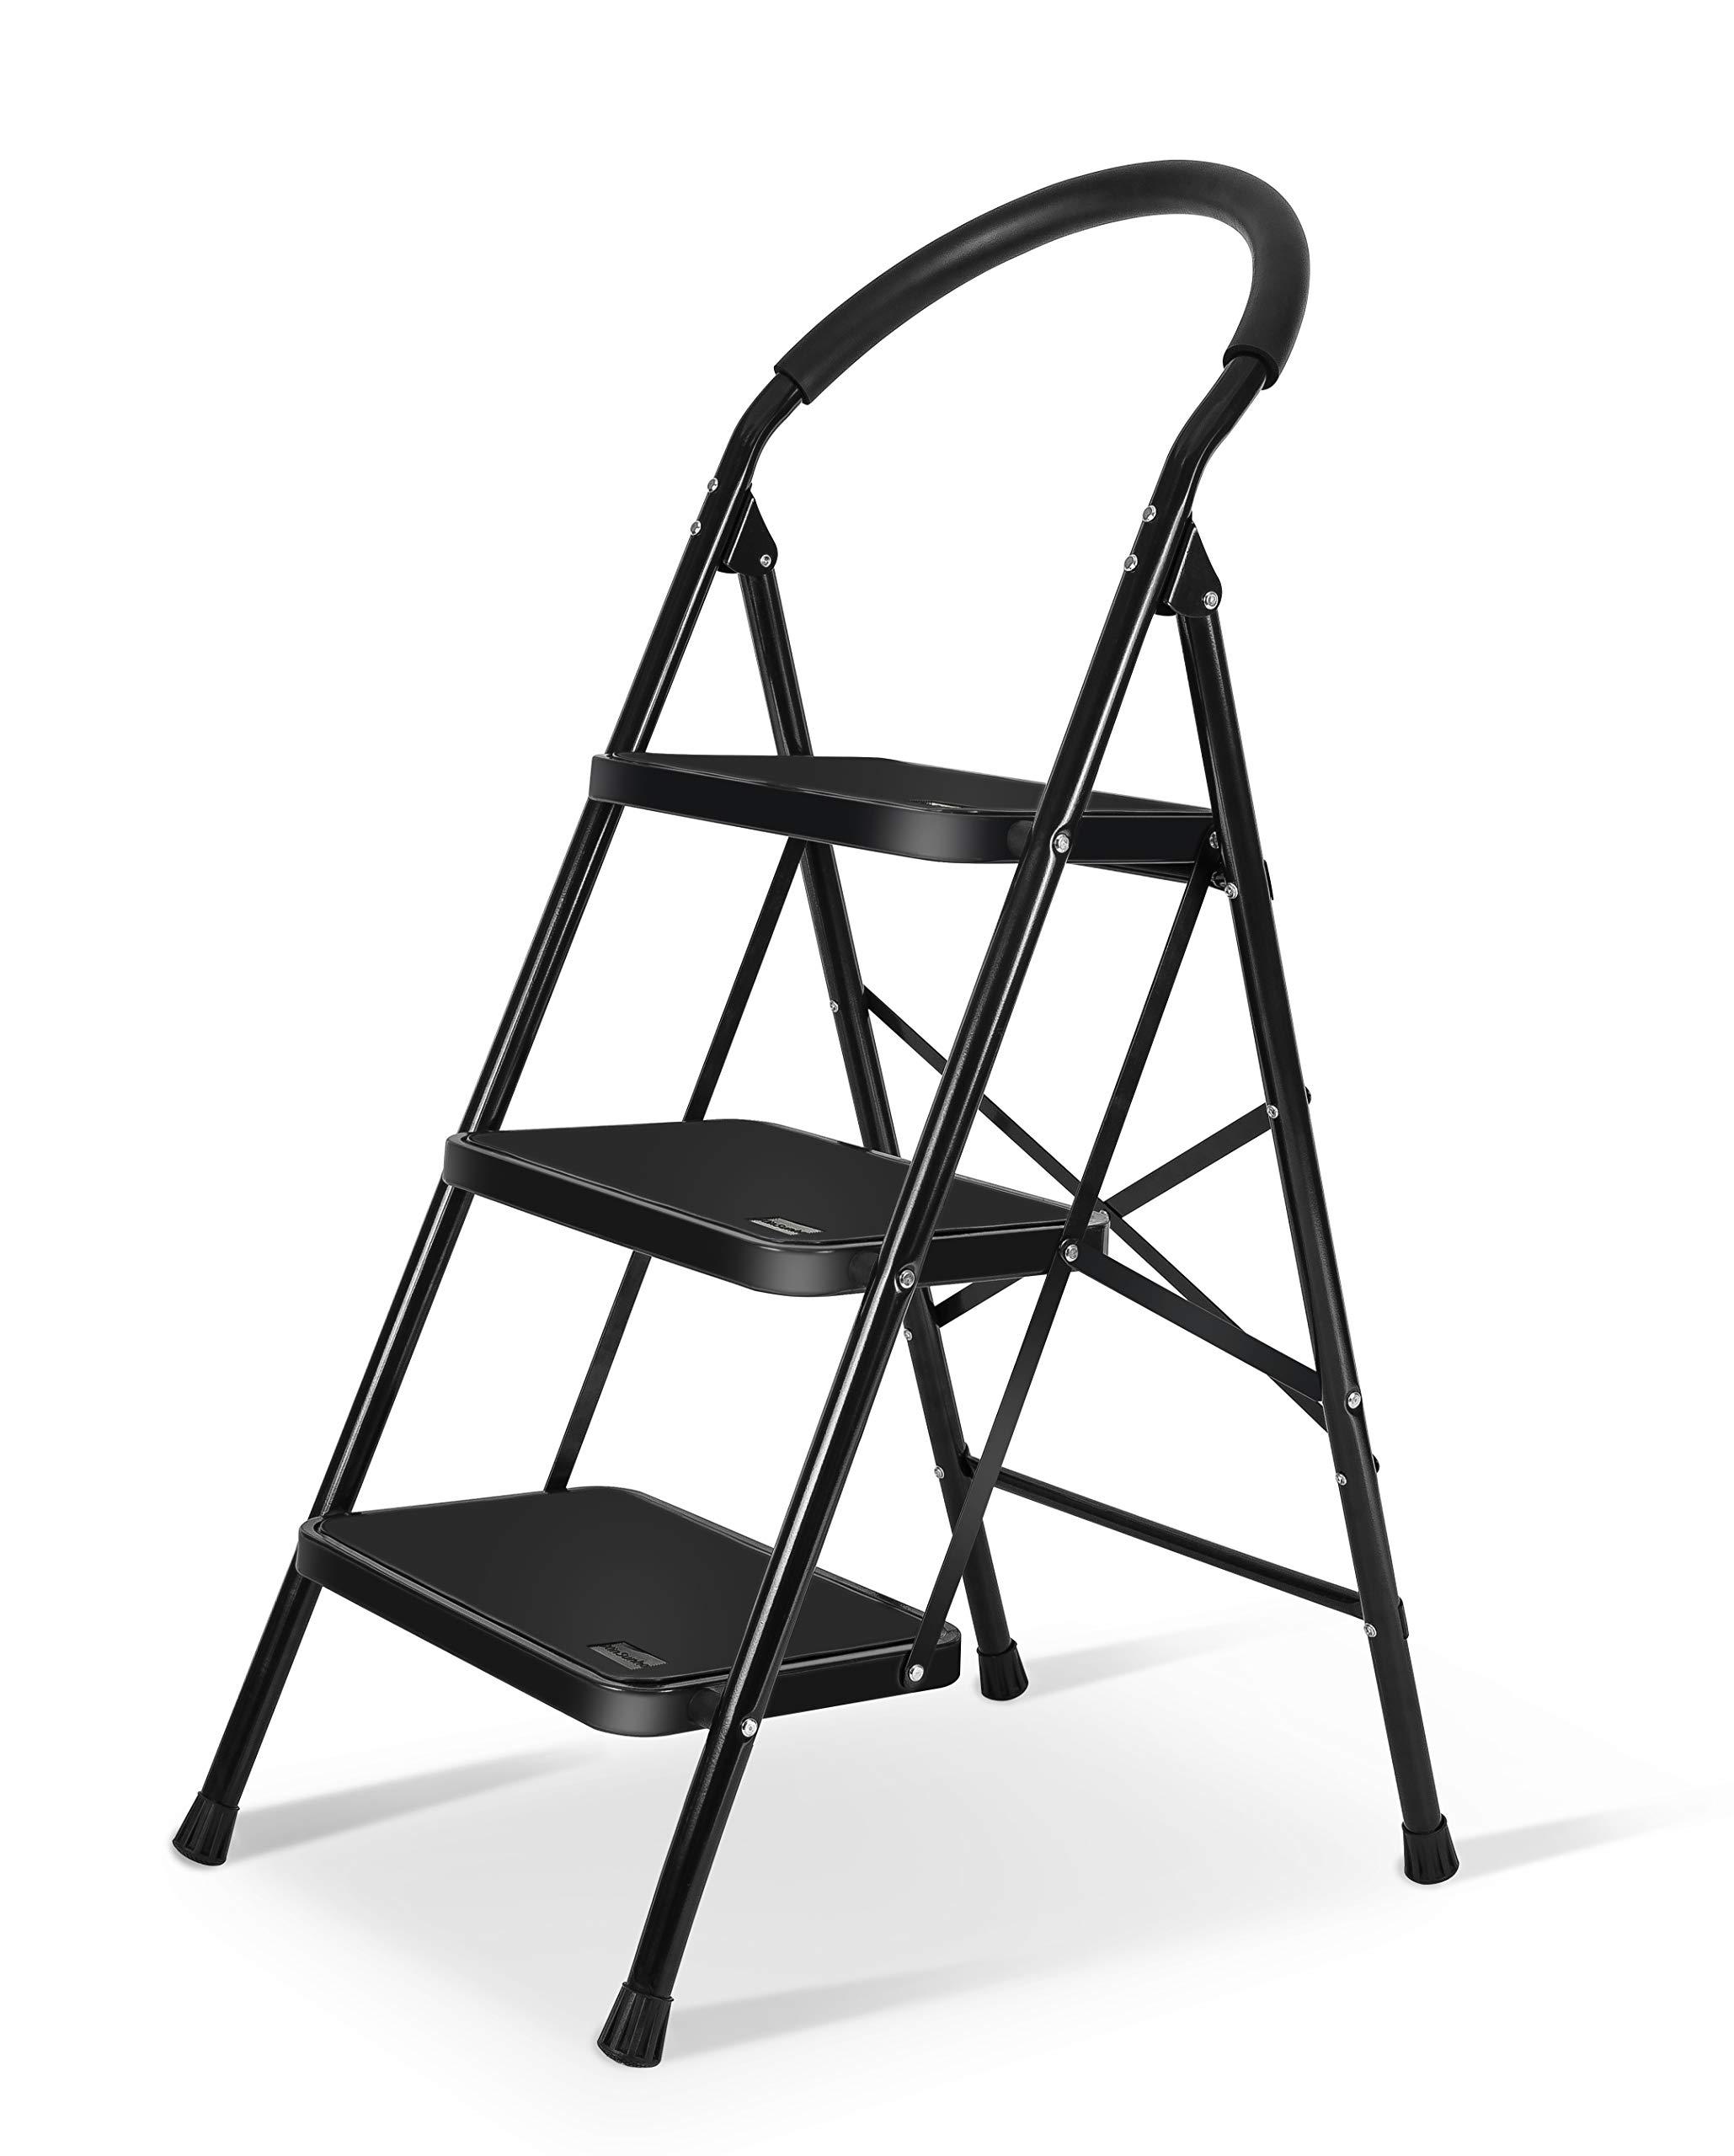 3 Step Ladder with Rubber Handgrip Anti-Slip Pedal Lightweight Ladder 330lbs Capacity Black by XinSunho